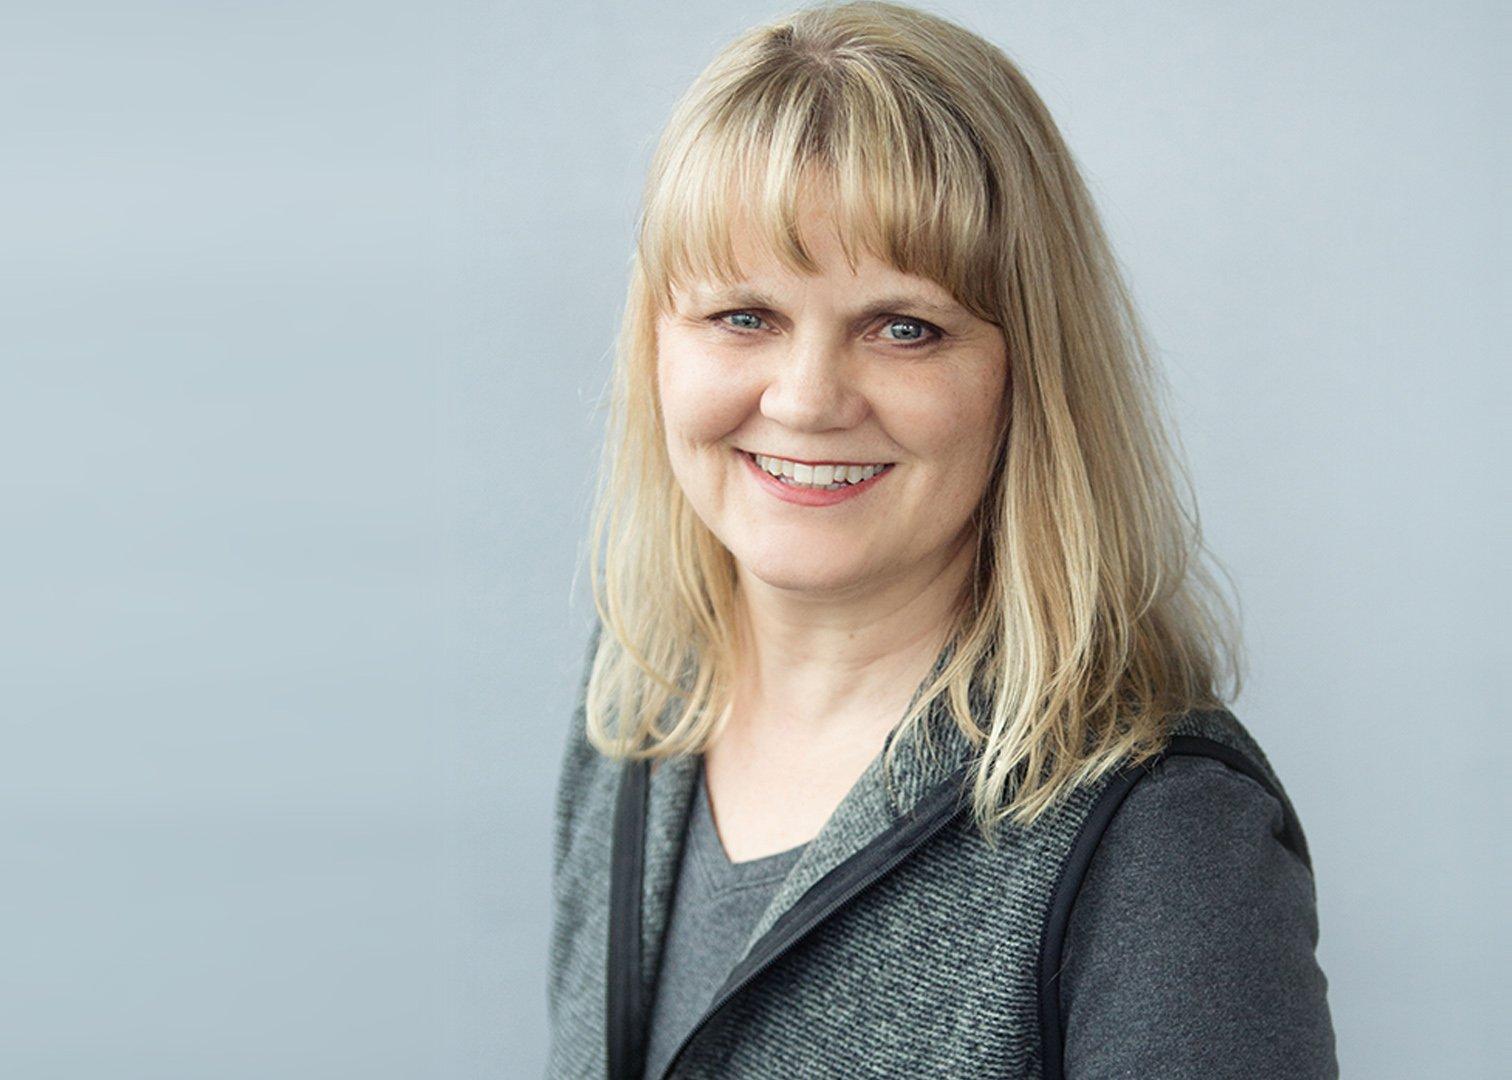 Barb Coplen Senior Solutions Architect